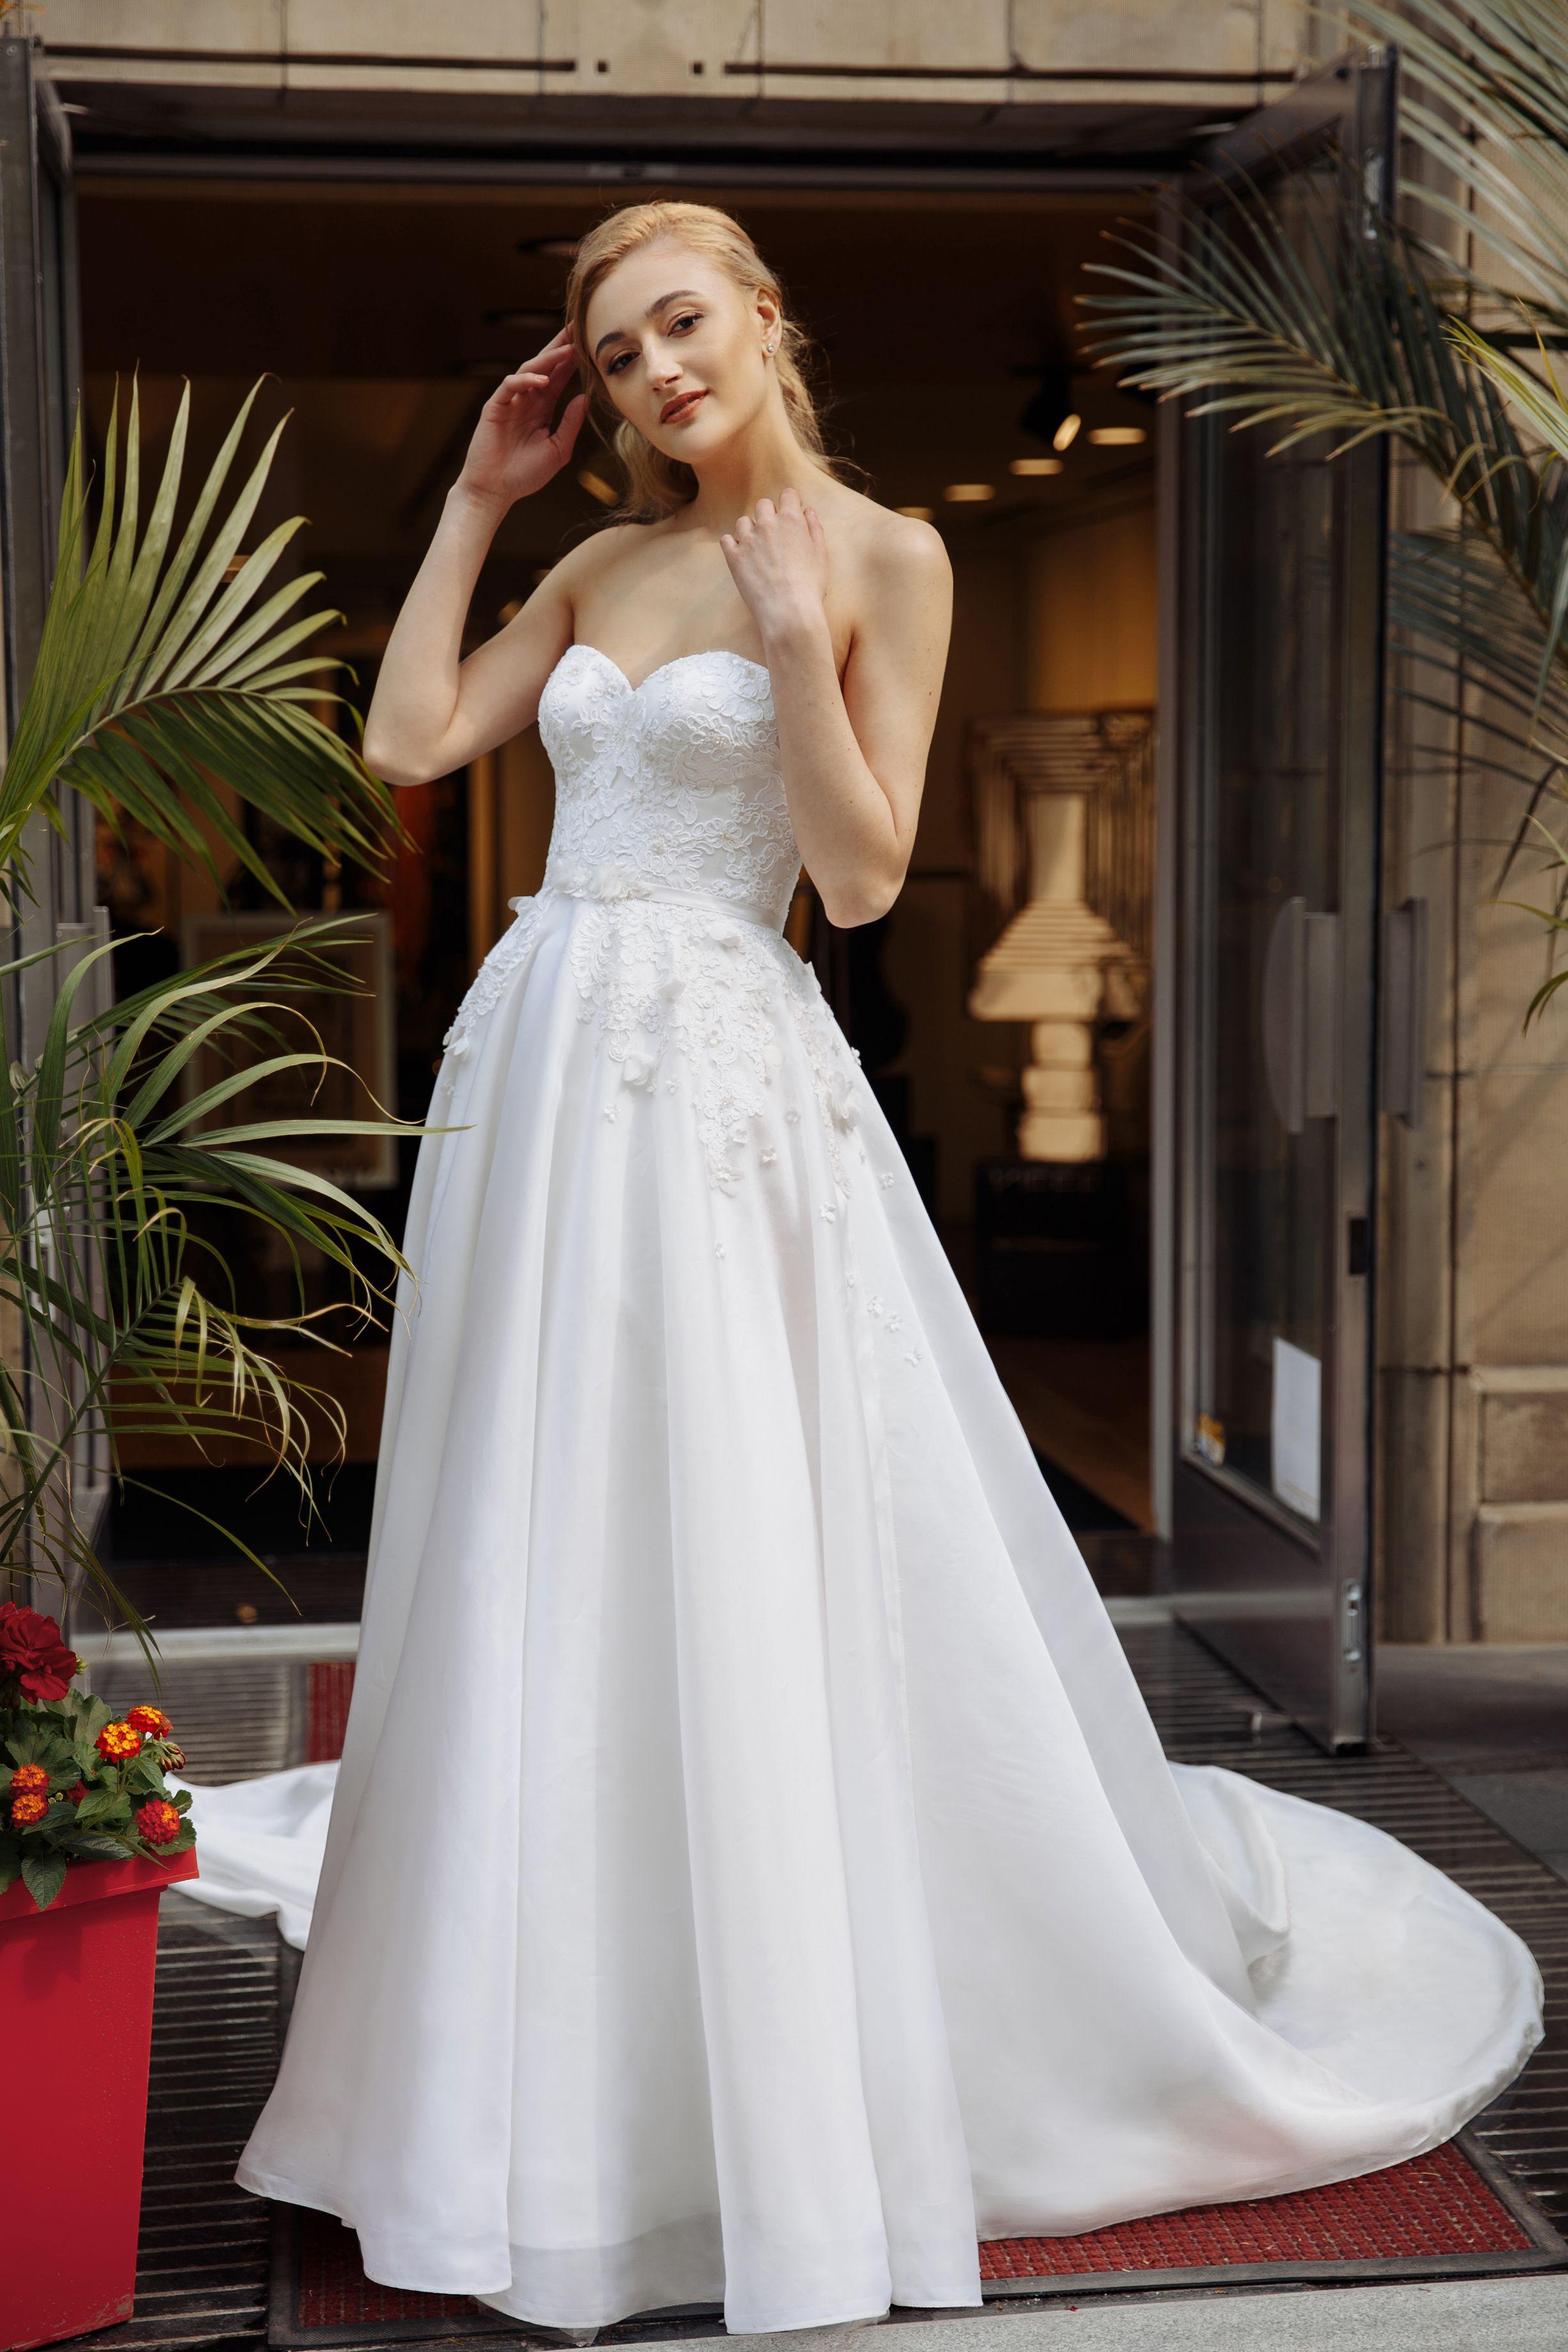 princess dress with long train corset lace montreal wedding dresses